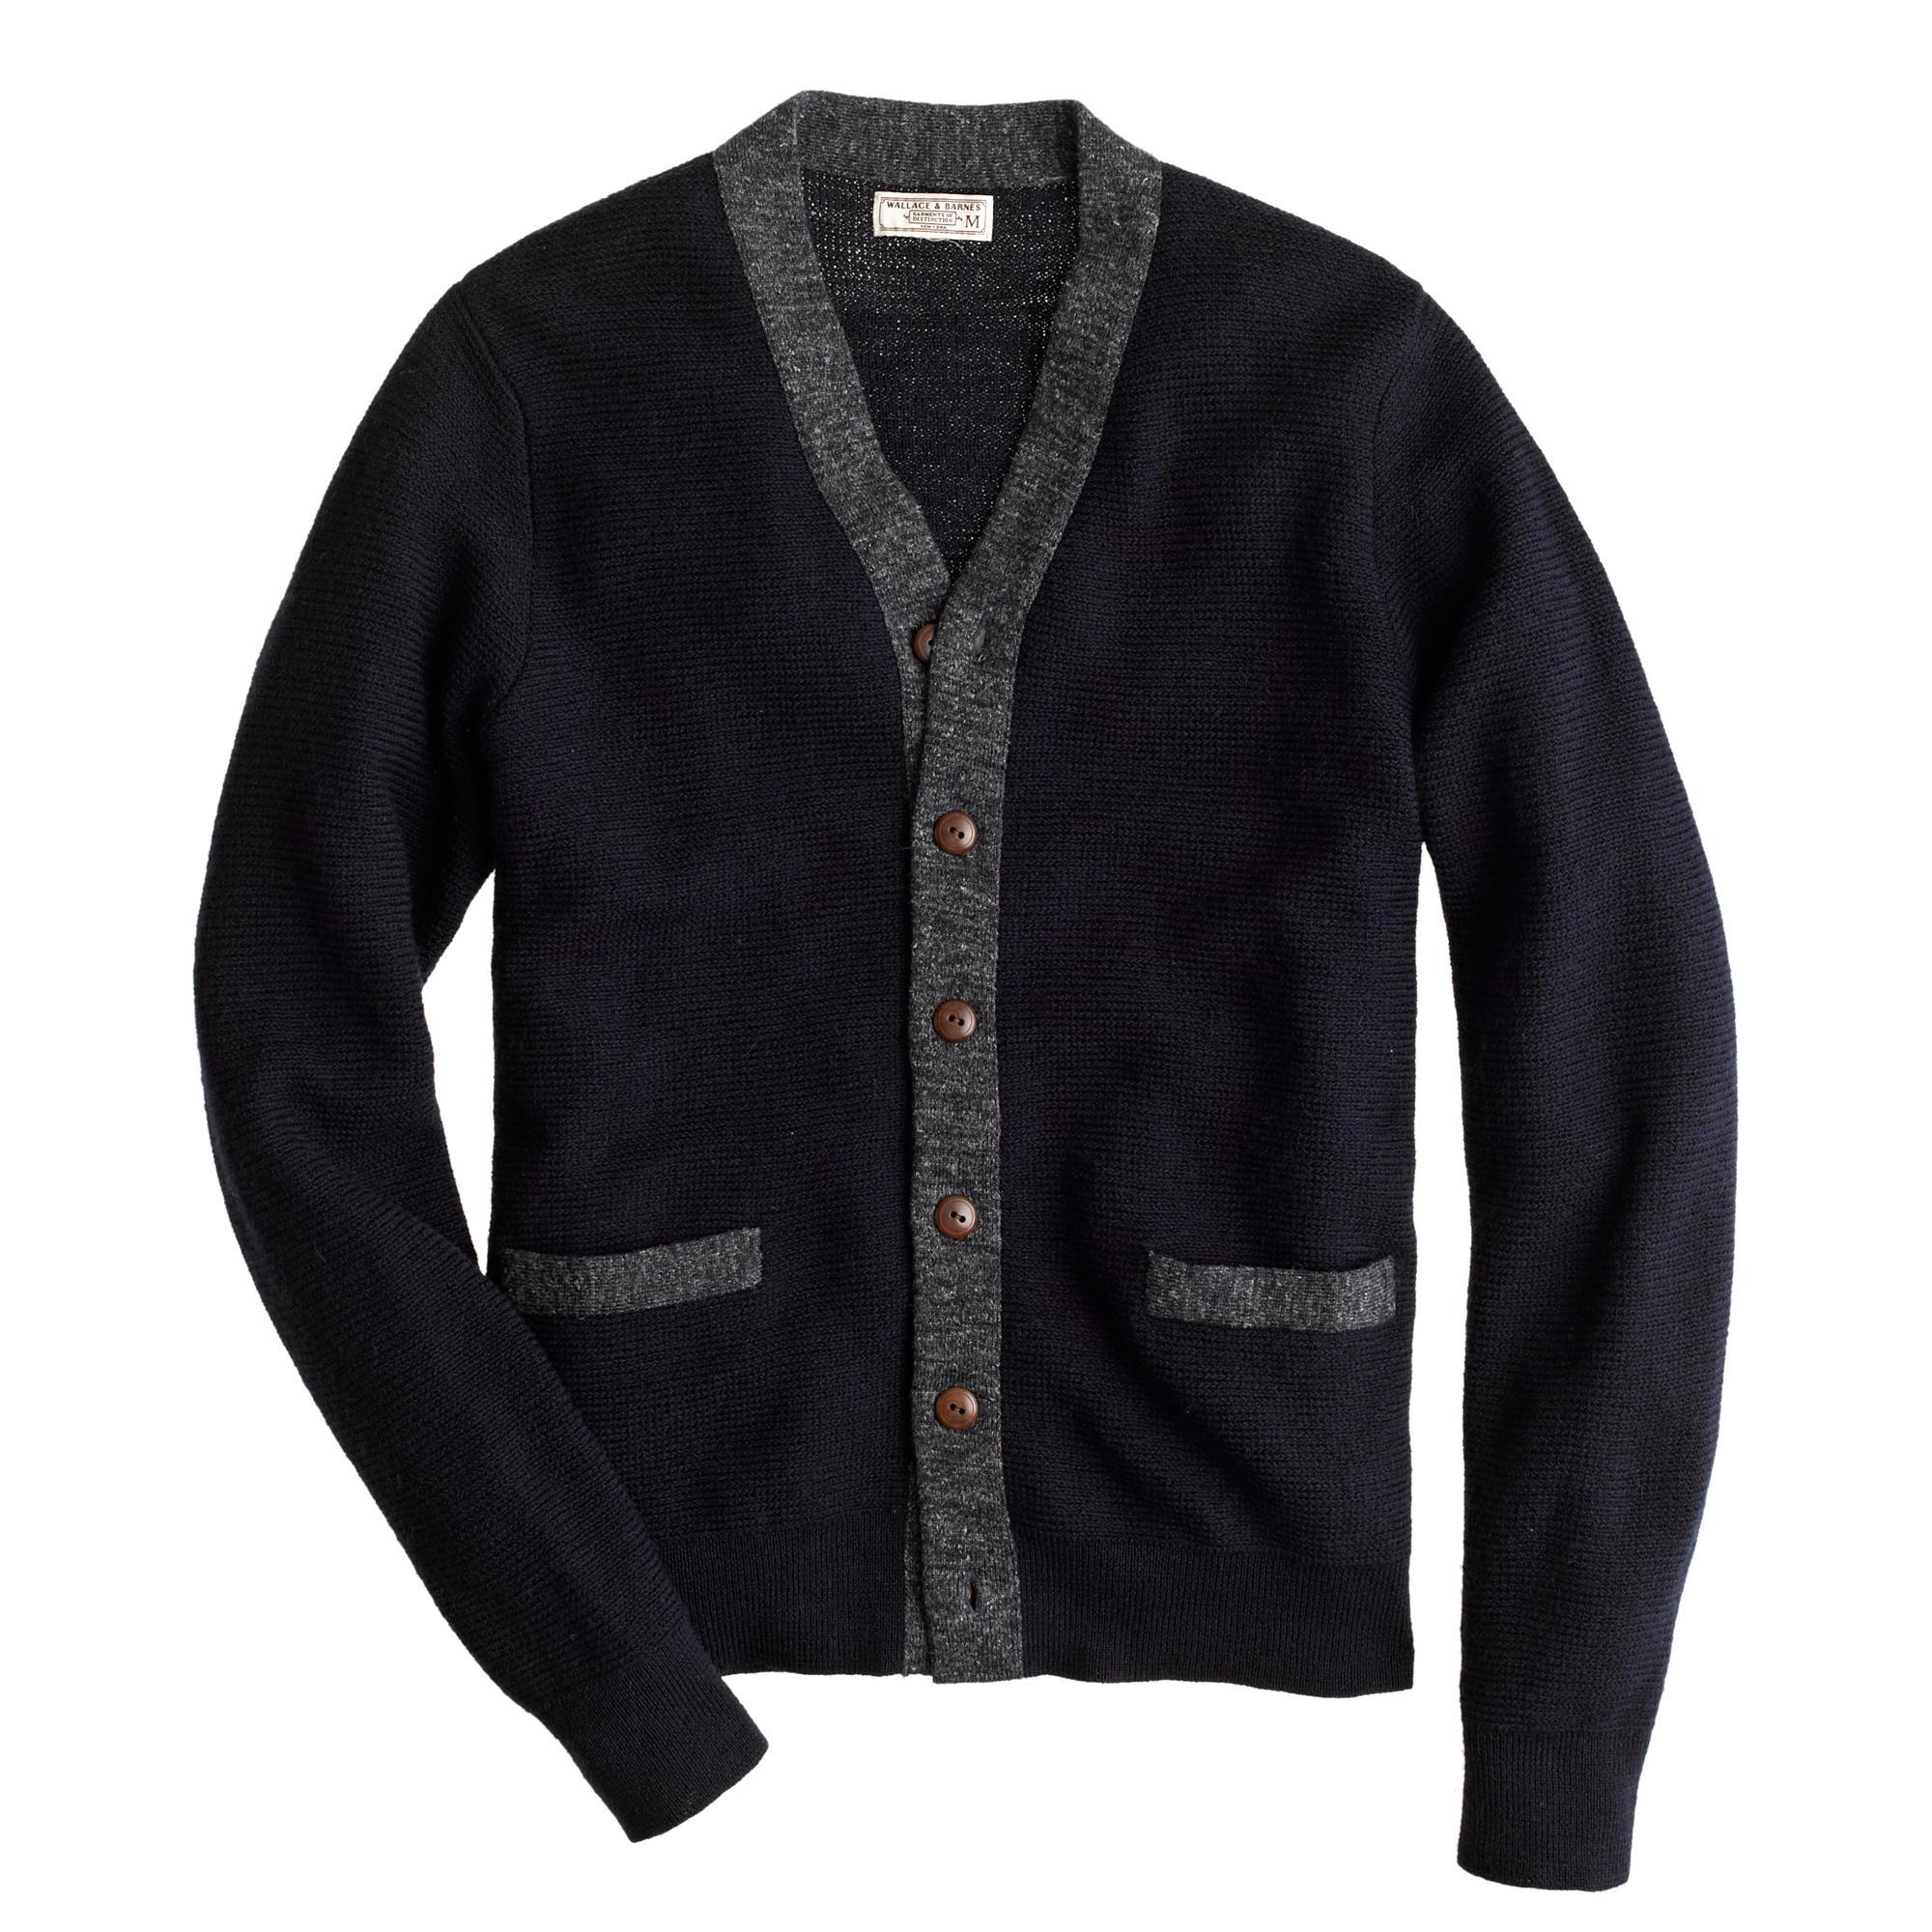 Wallace & Barnes Wool Contrast Cardigan :